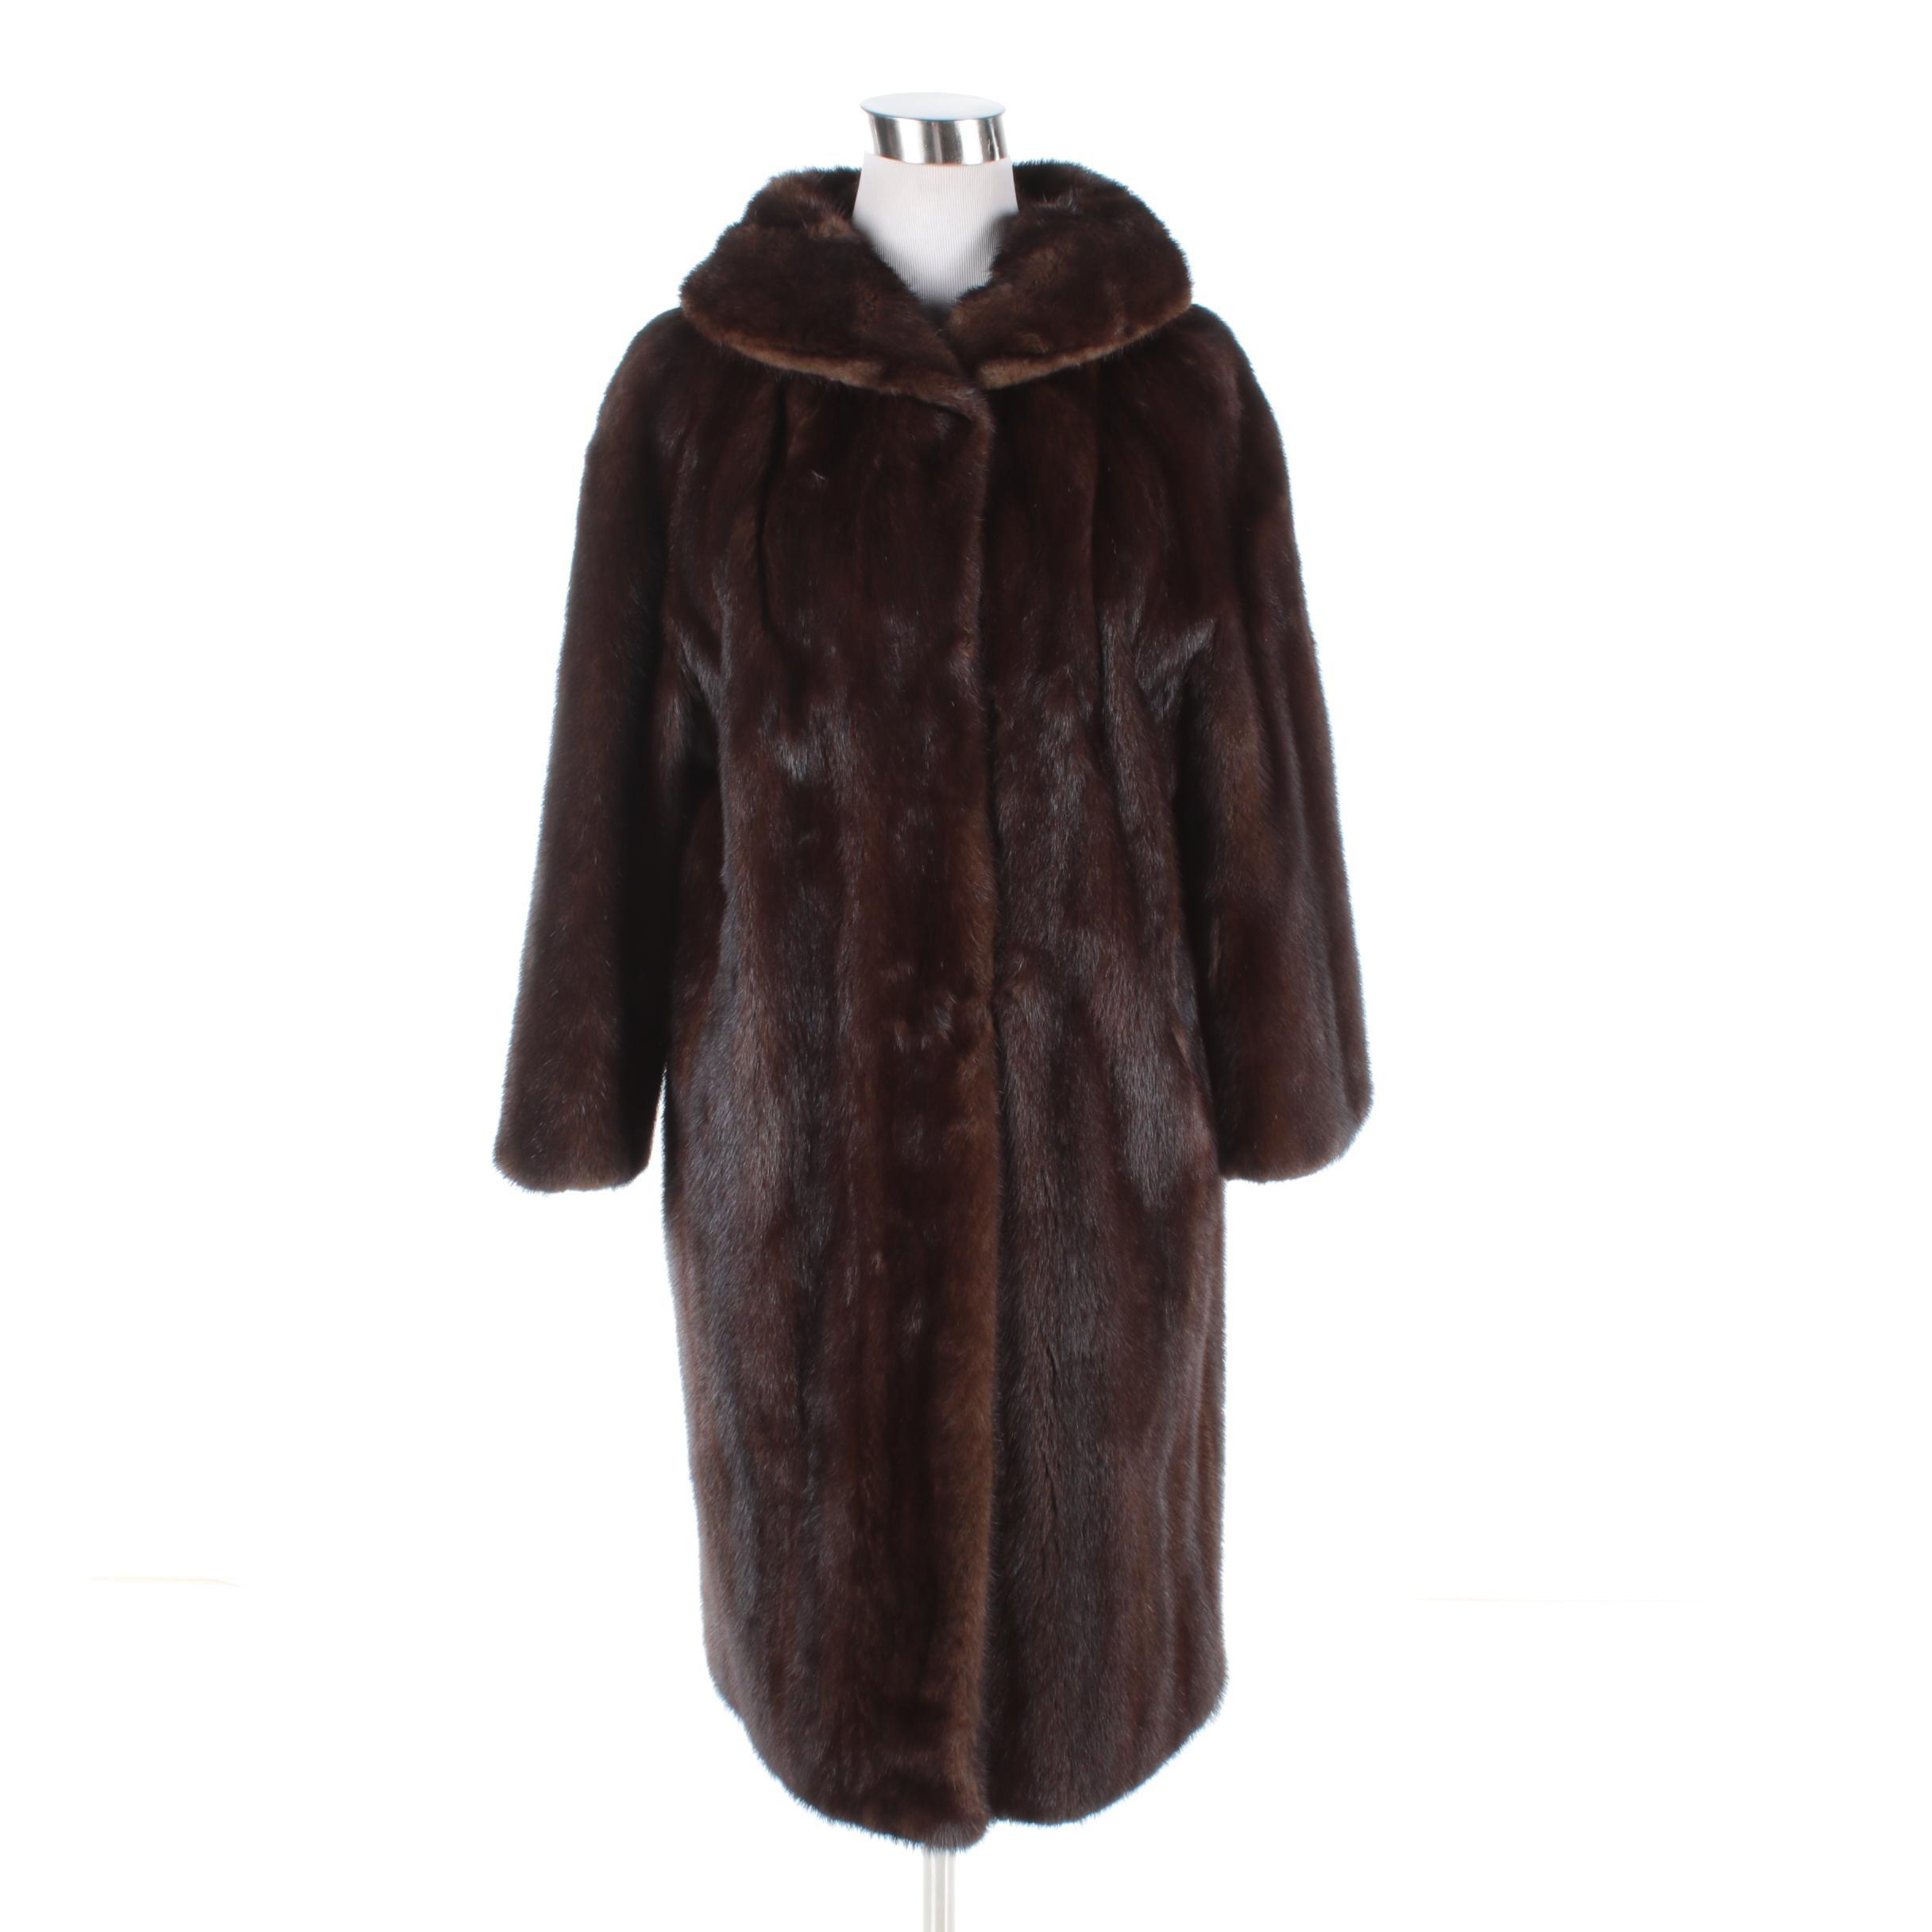 Women's Vintage Gatelys Mink Fur Coat